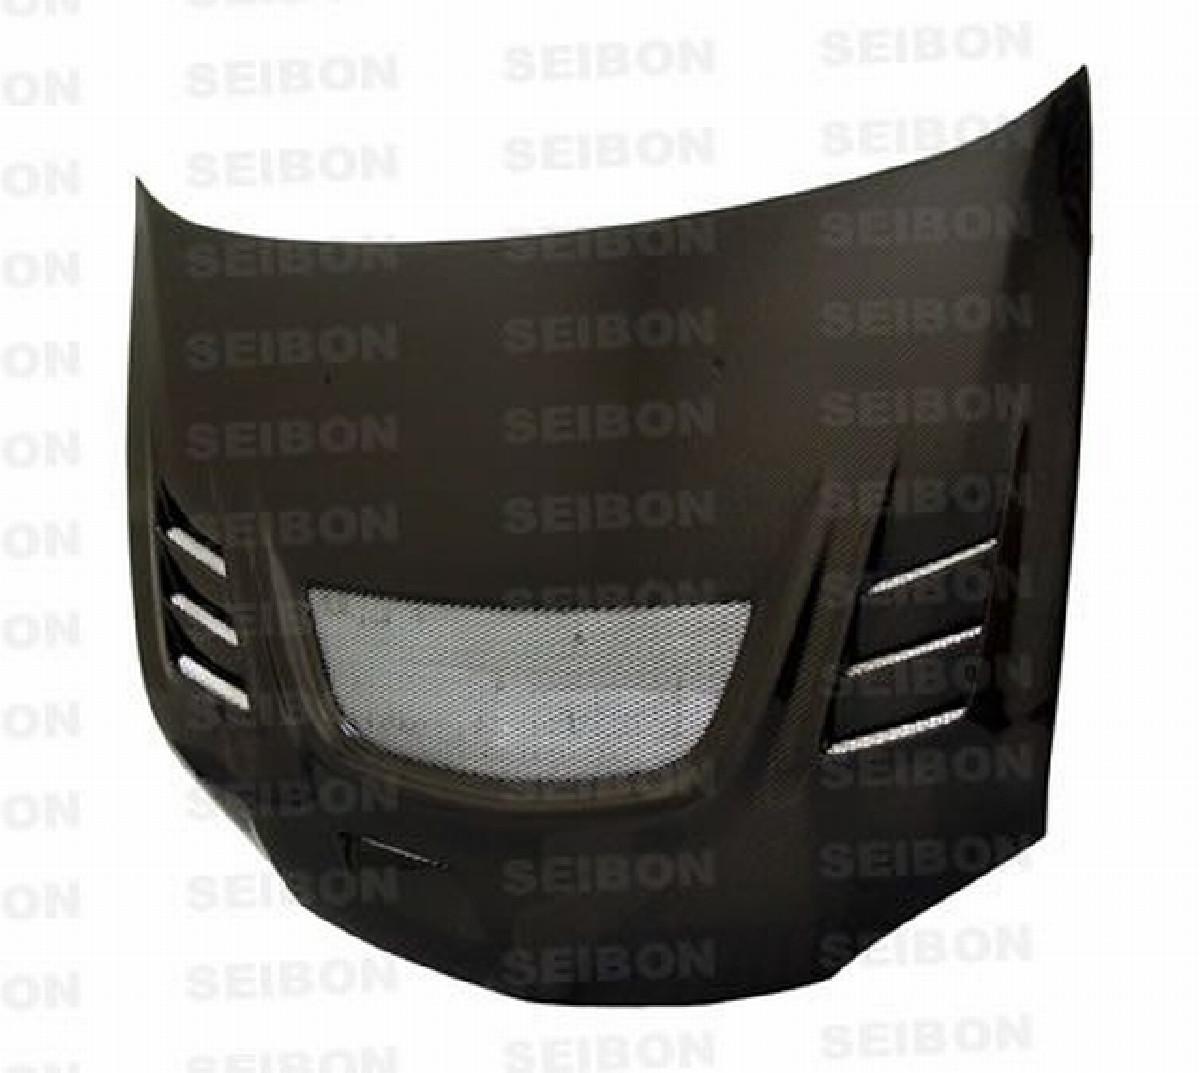 Seibon CW Carbon Motorhaube Mitsubishi Lancer EVO 8/9